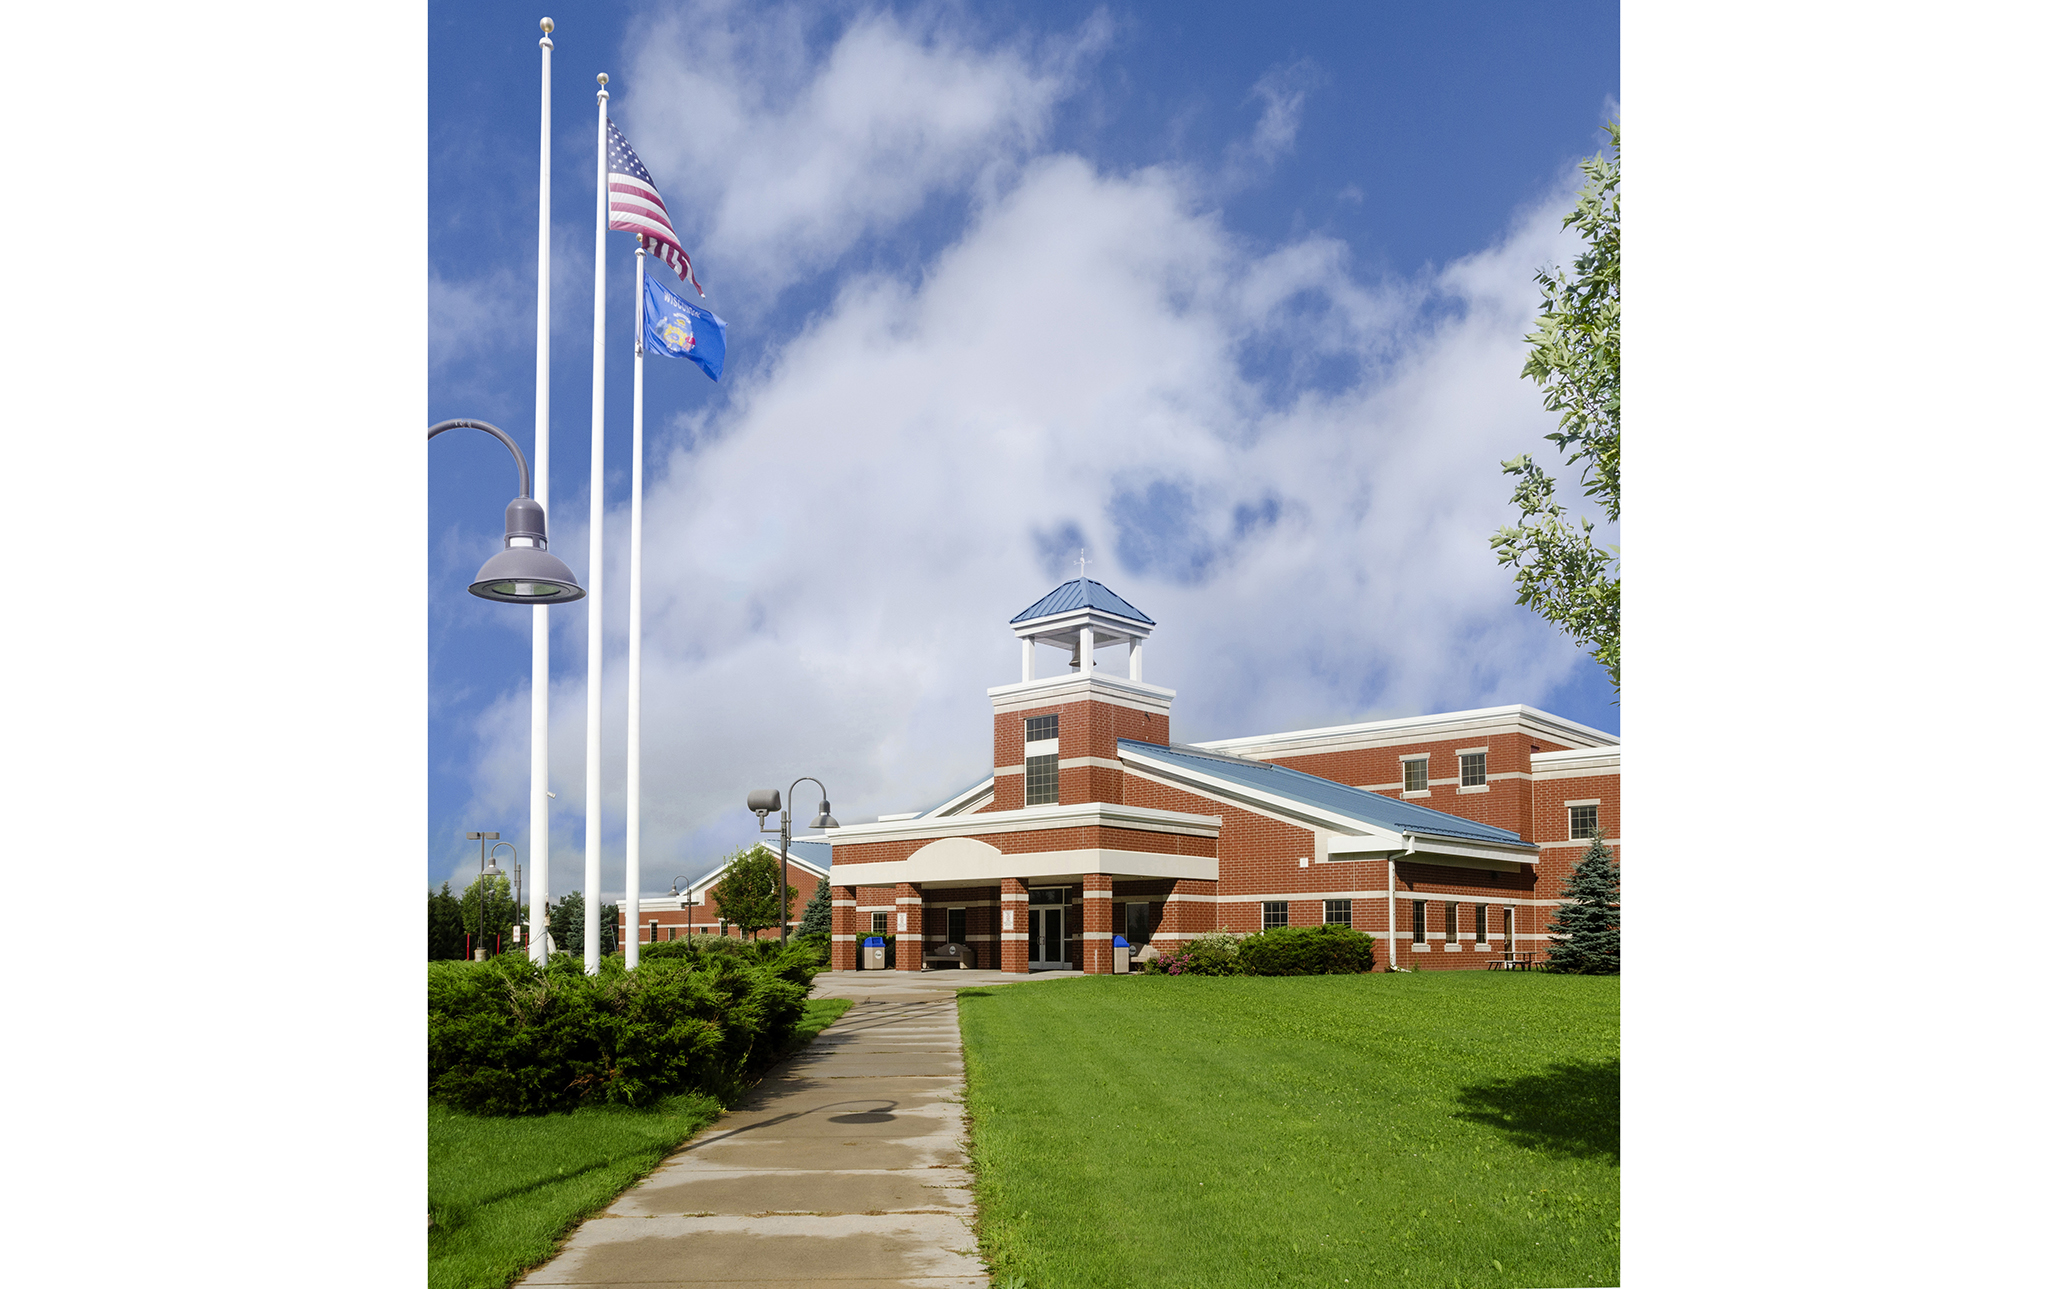 1_Mountain-Bay-Elementary-School